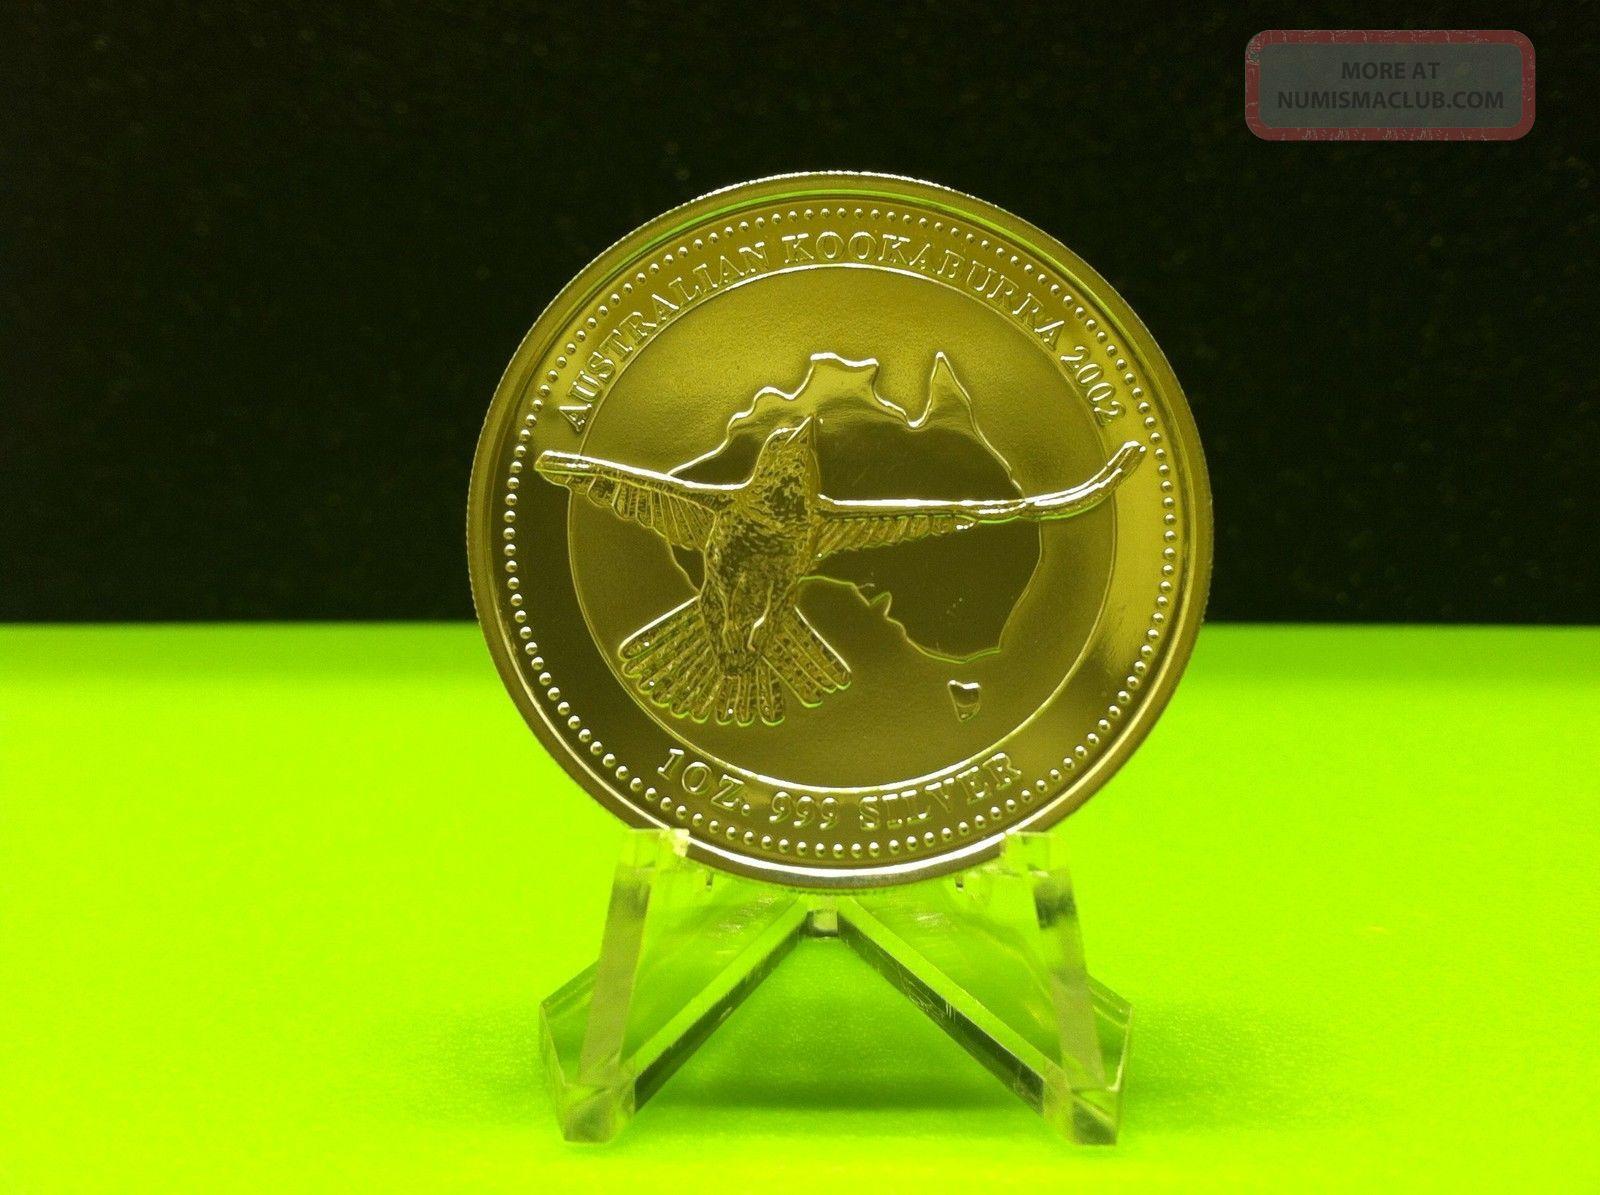 2002 Australian Kookaburra 1 Troy Oz.  999 Silver Round - Lightly Circulated Silver photo